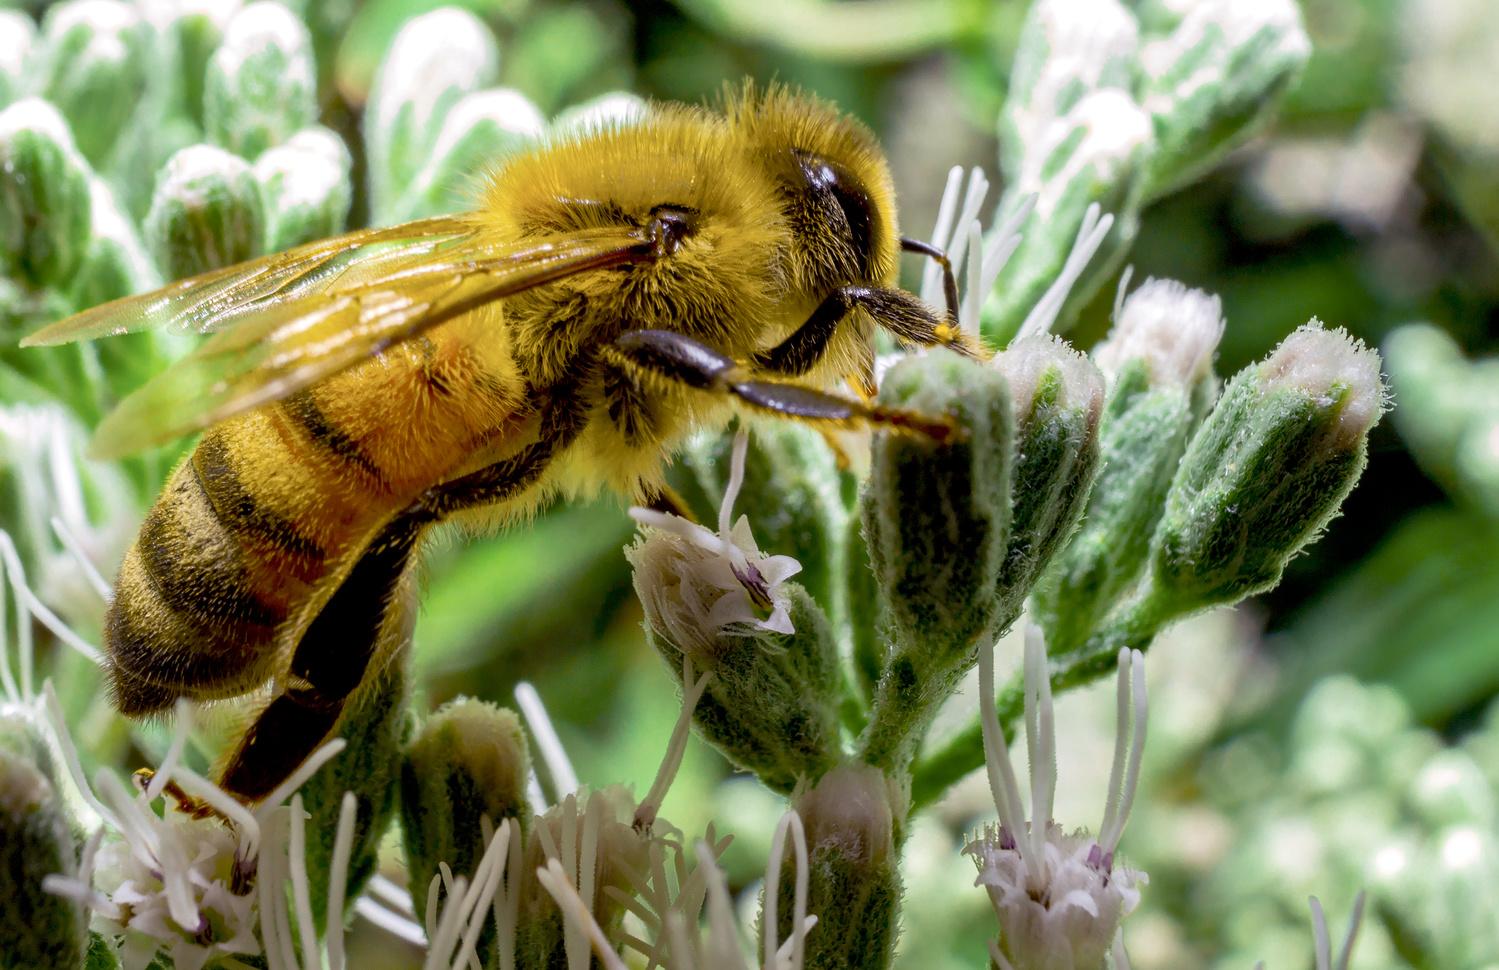 Eric the 1/2 a Bee by Robert Felker